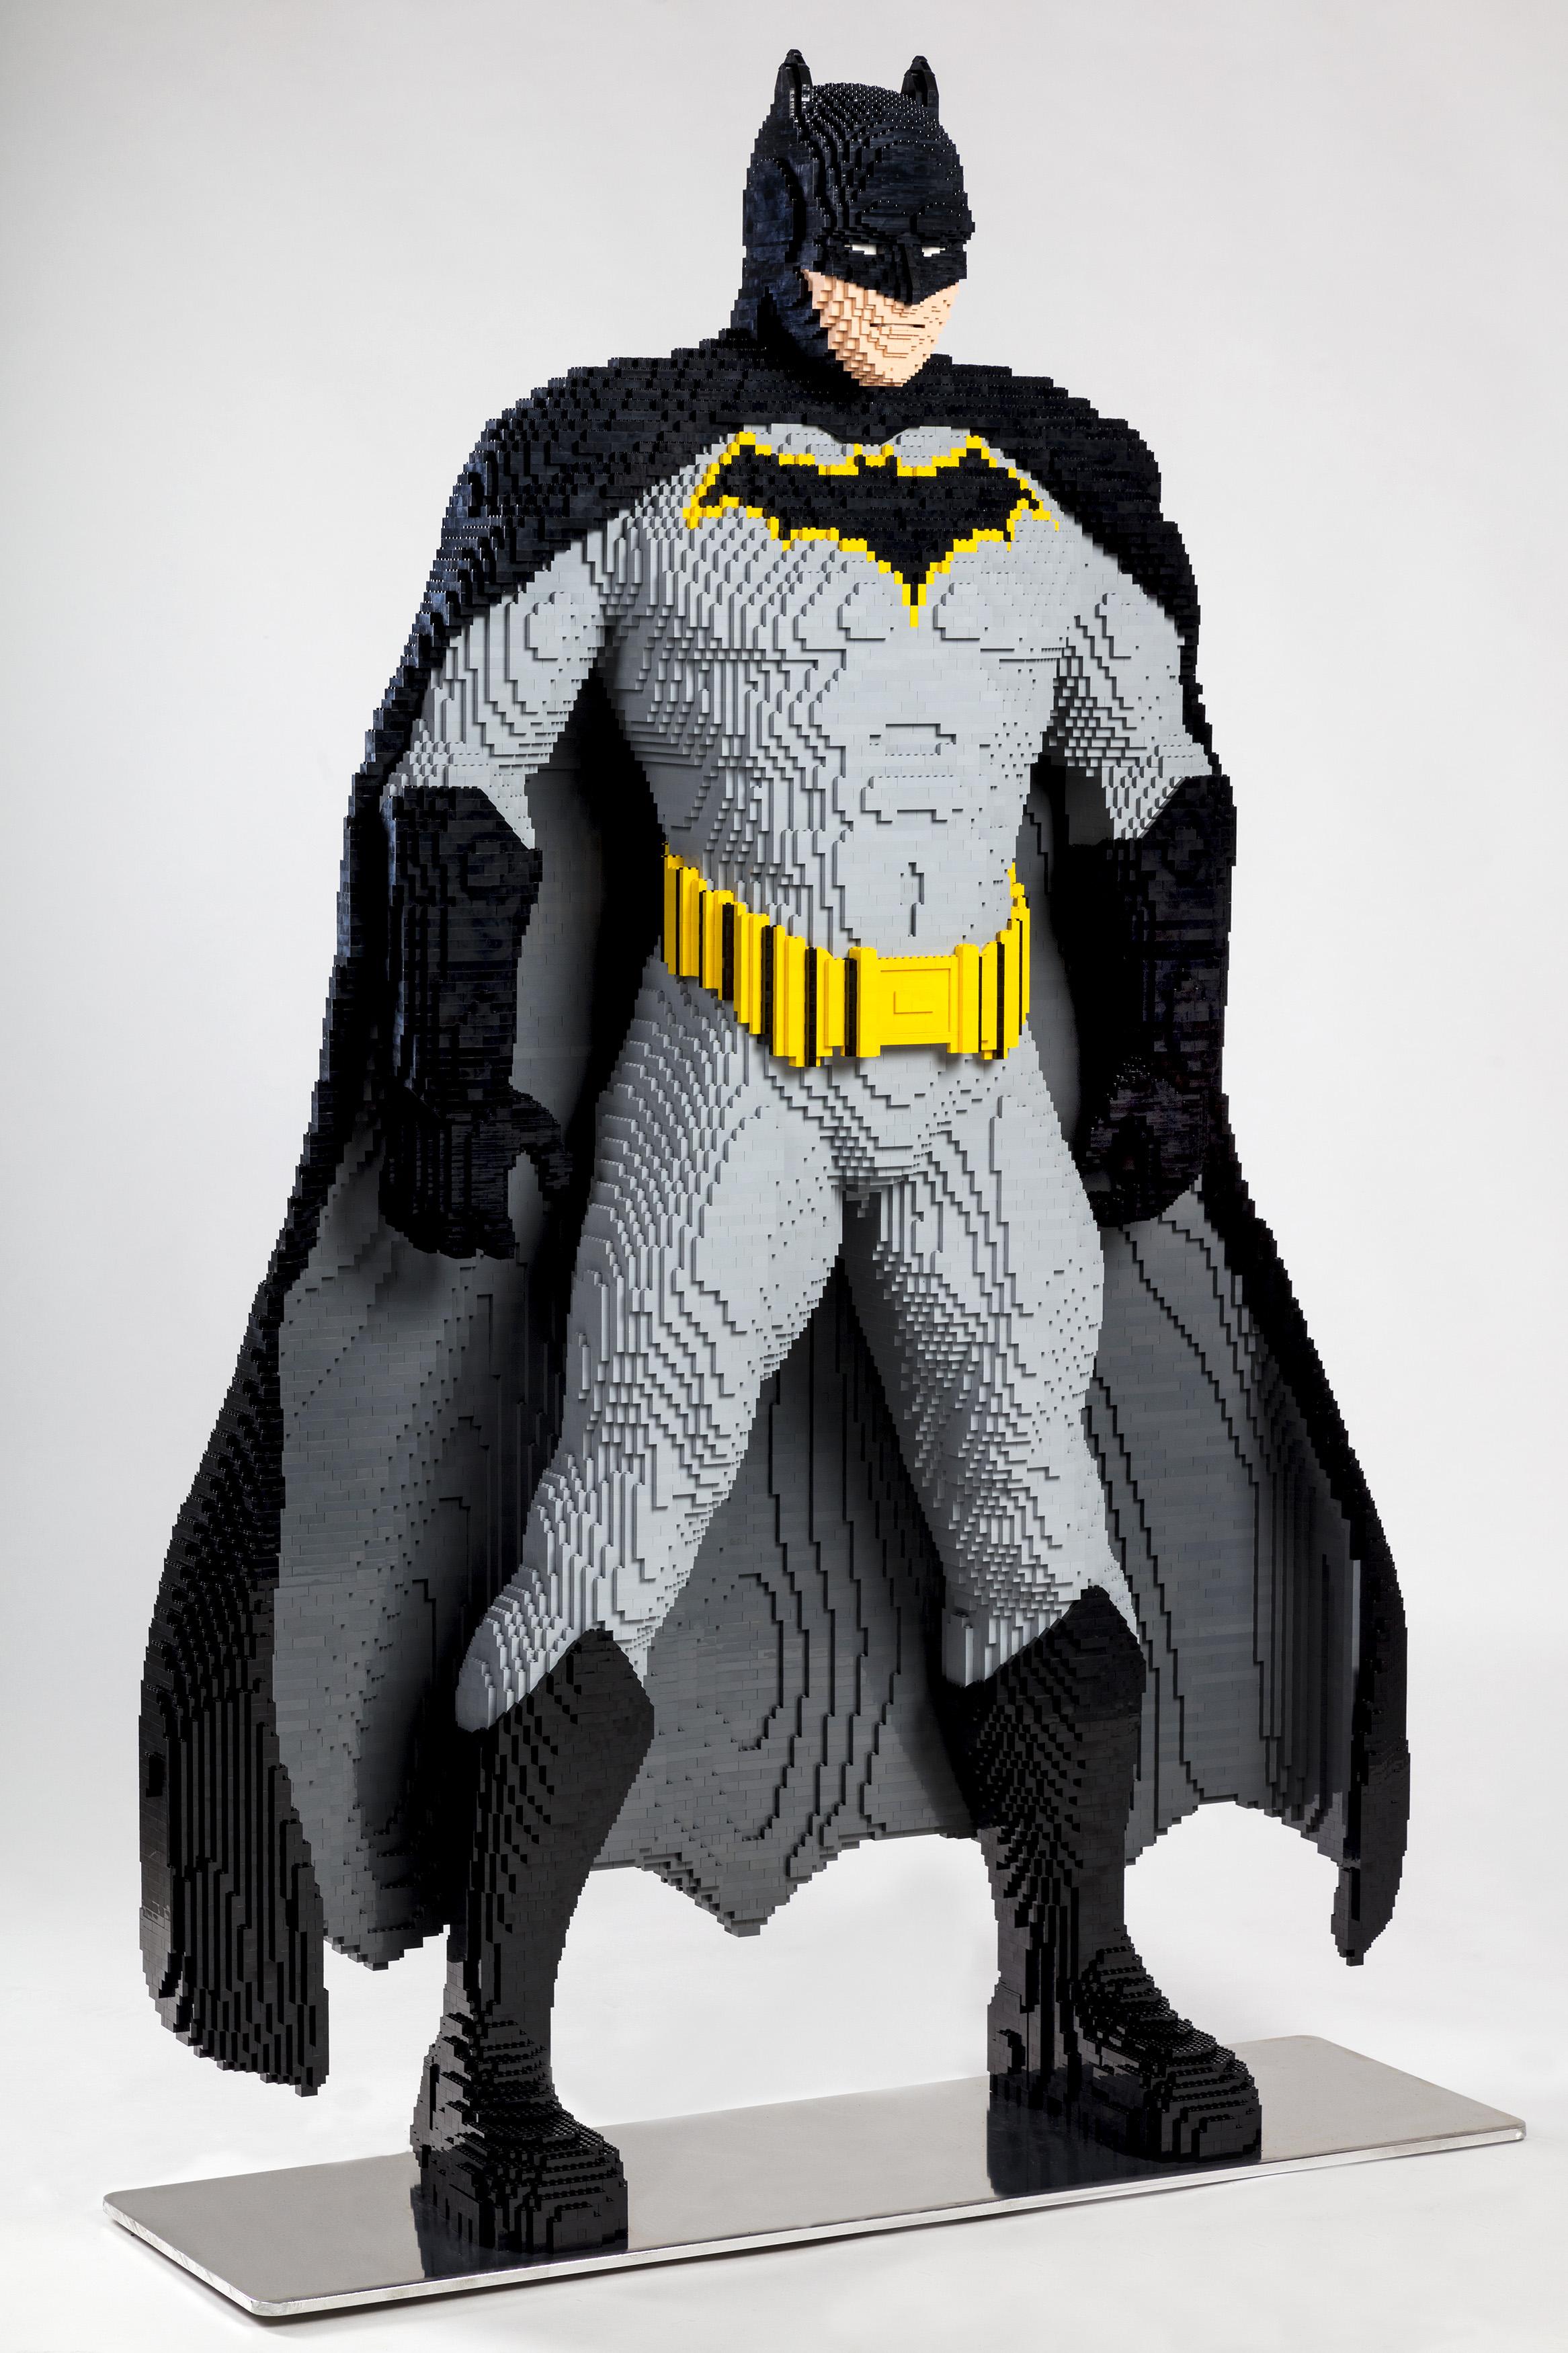 LEGO_Batman_SDCC2019_Angle.jpg